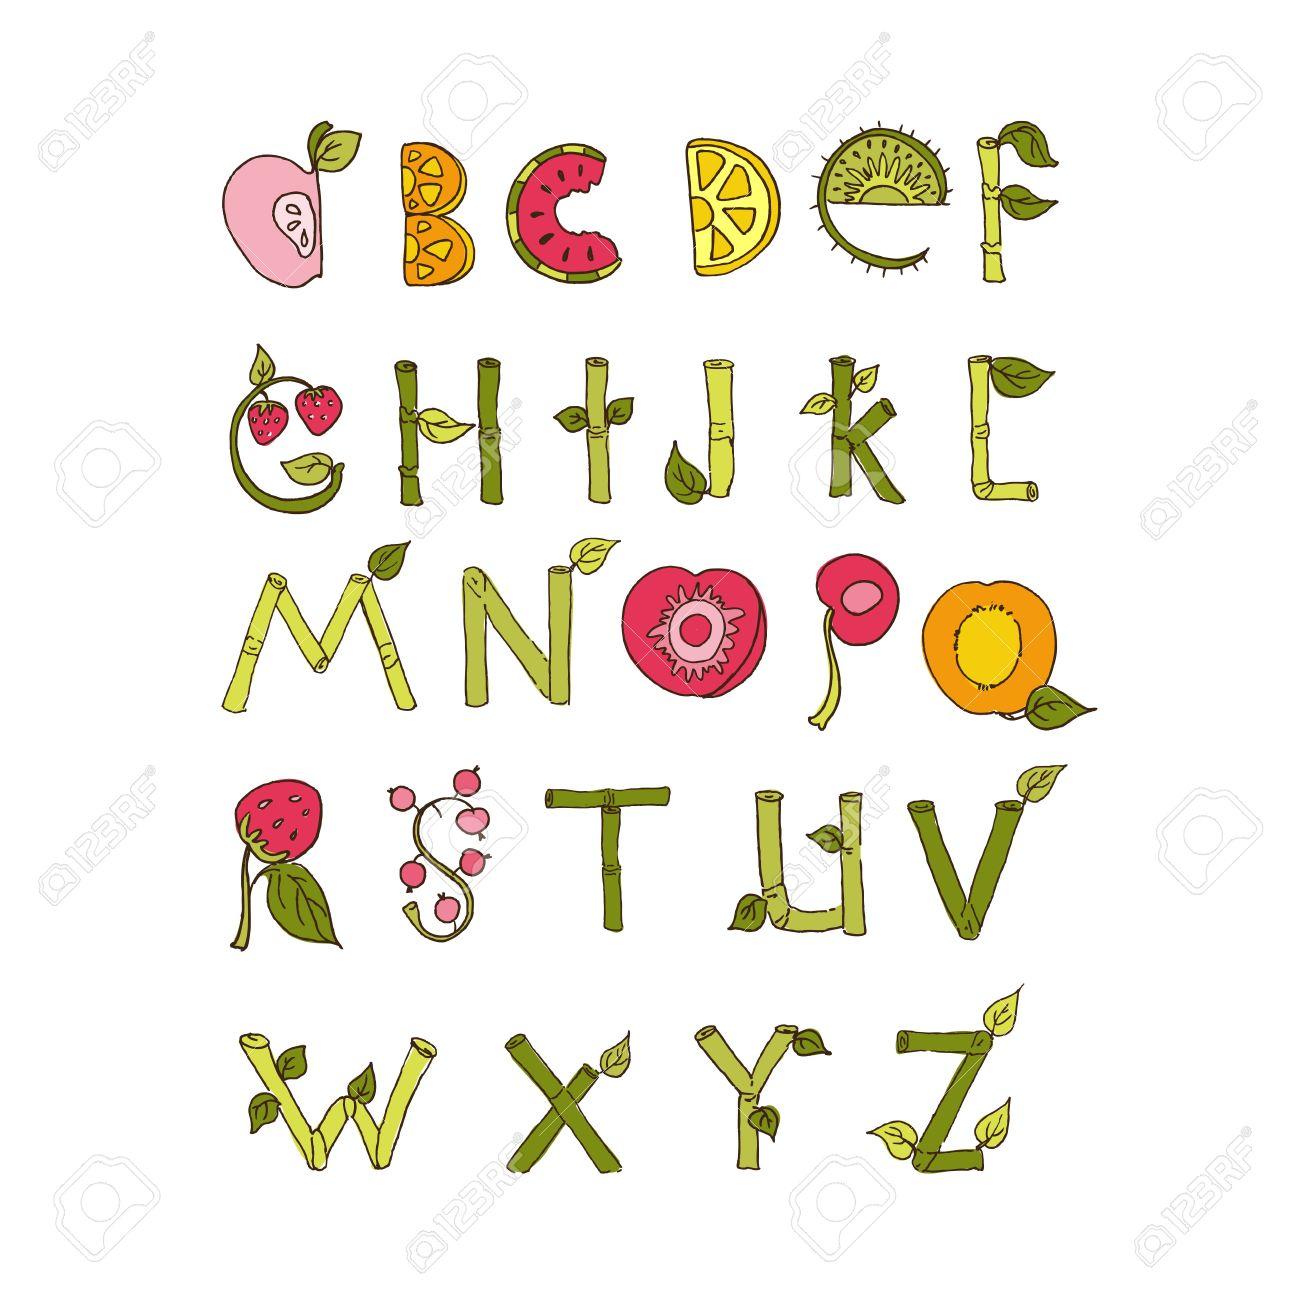 P Alphabet Pictures Images amp Photos  Photobucket